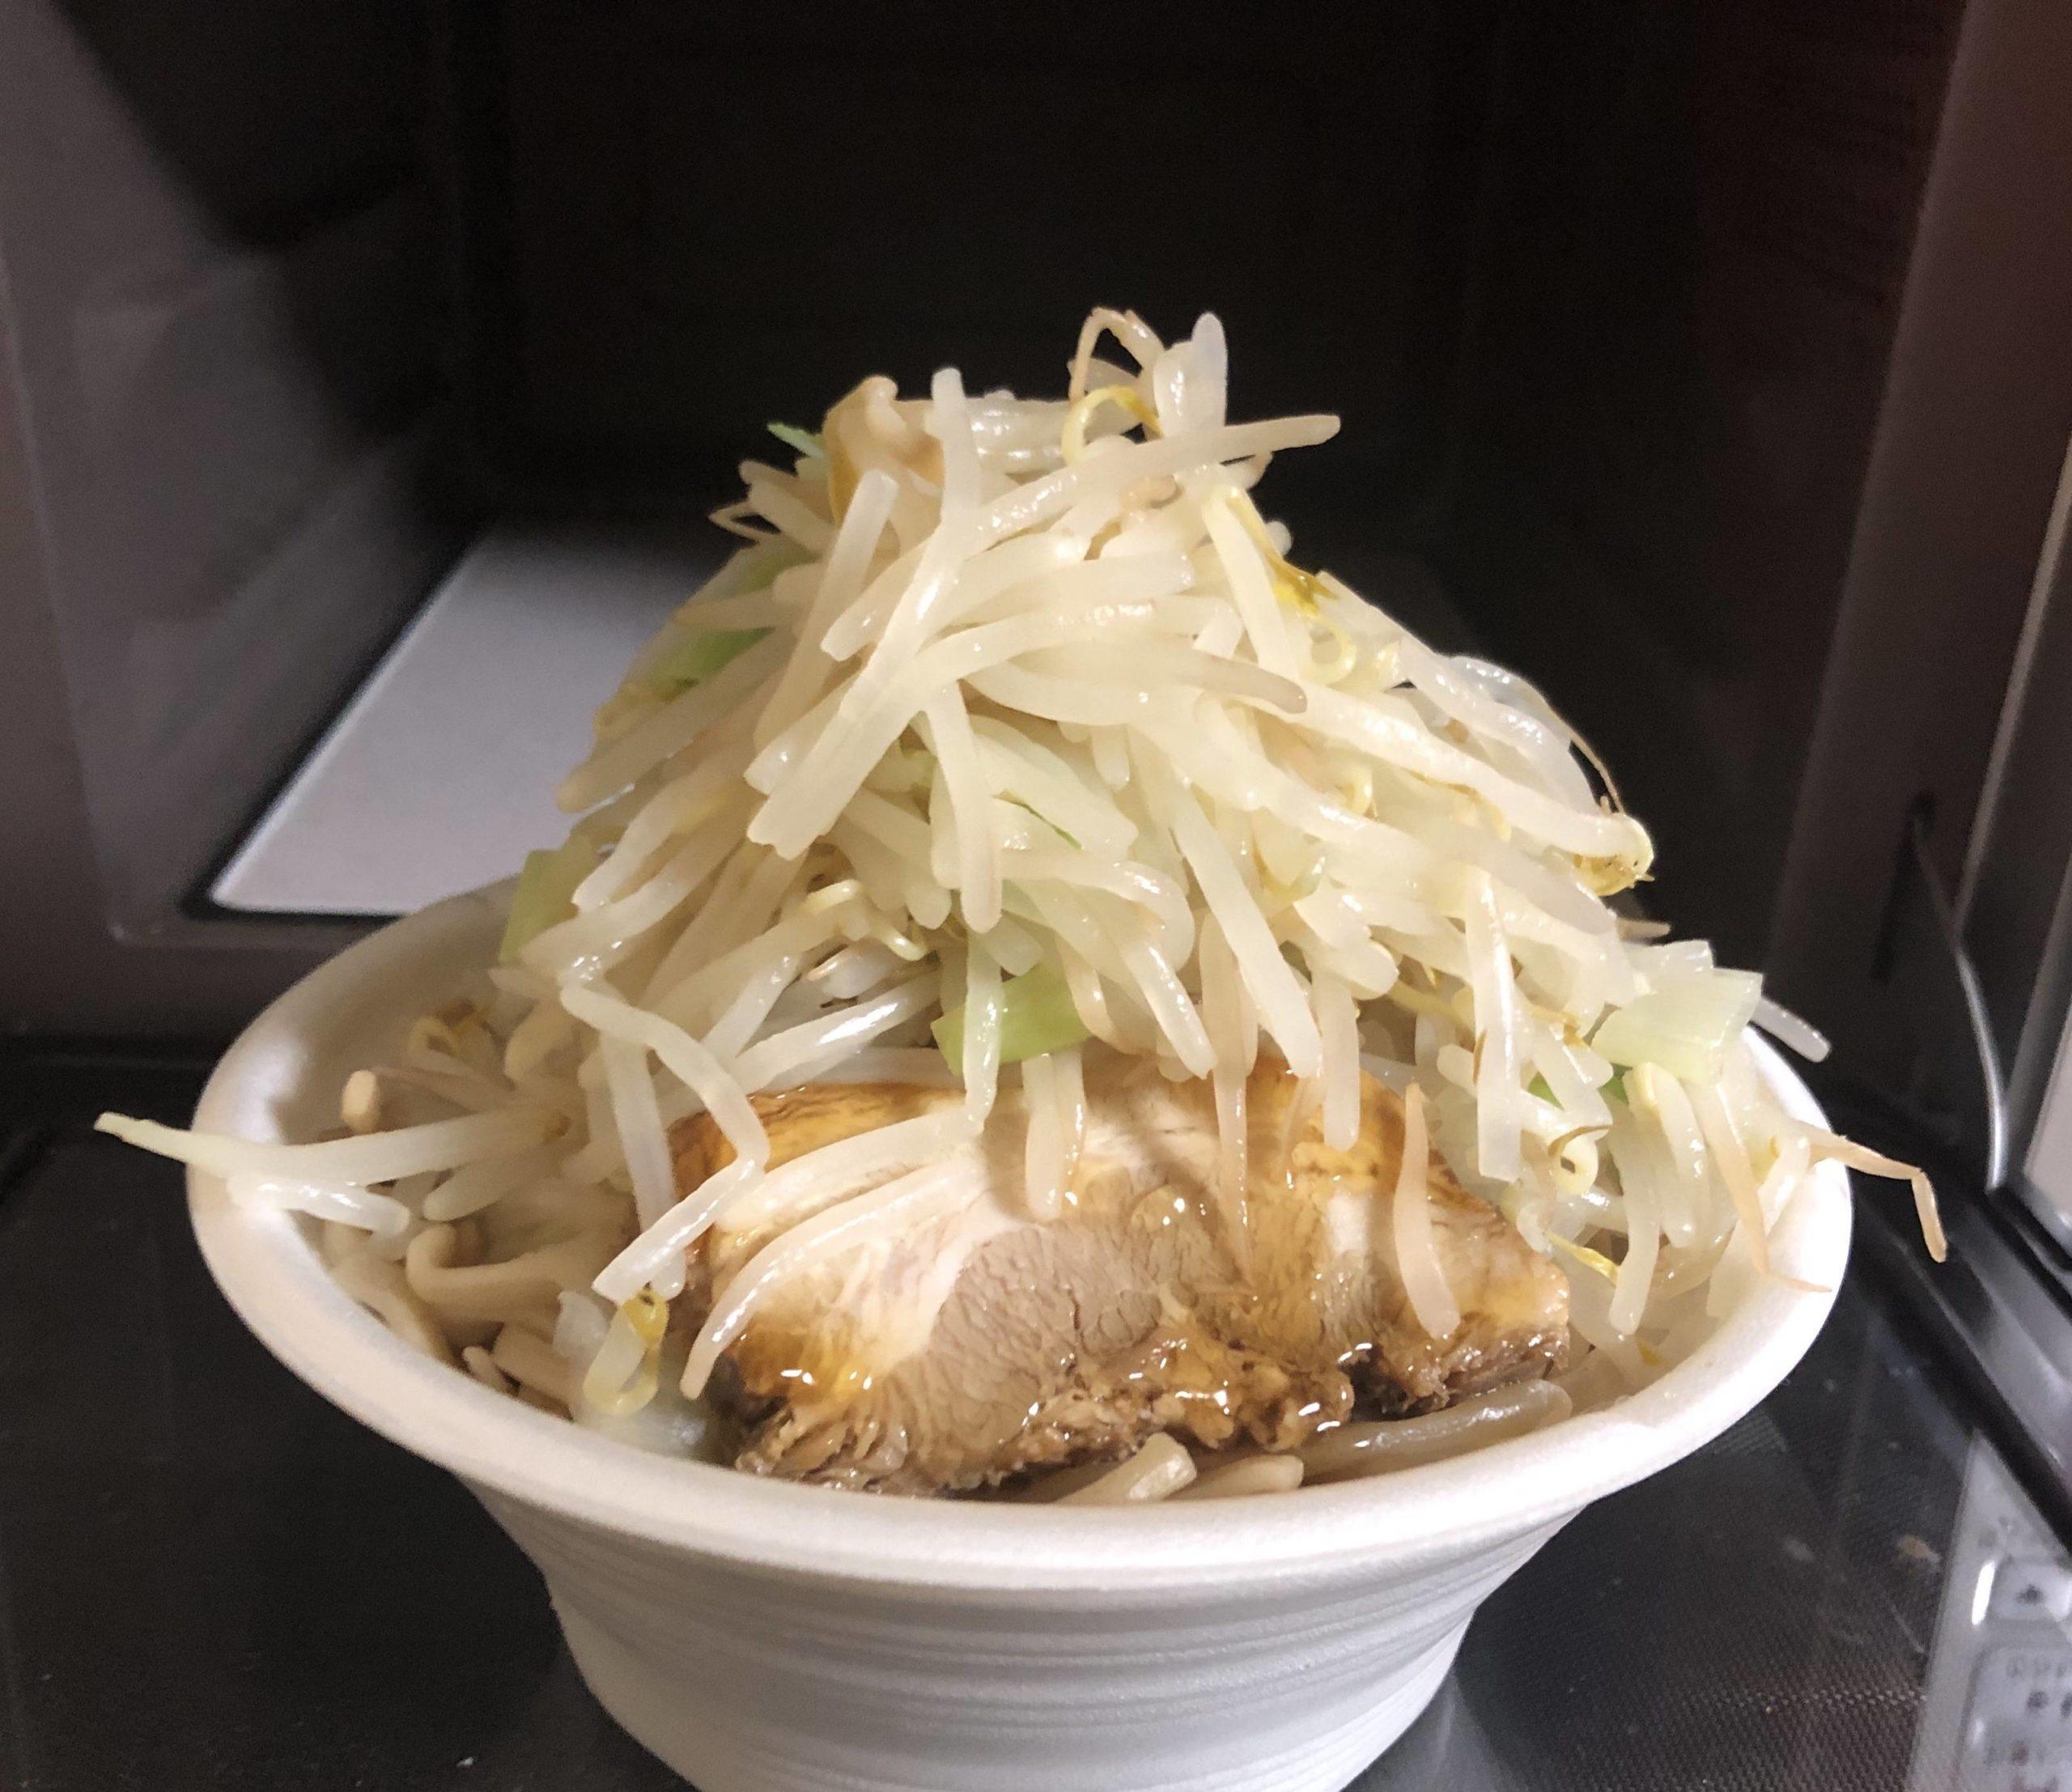 【画像】自作のラーメン二郎野菜マシマシできたぞー!!!wwwwwwwwwwwwwwwwww